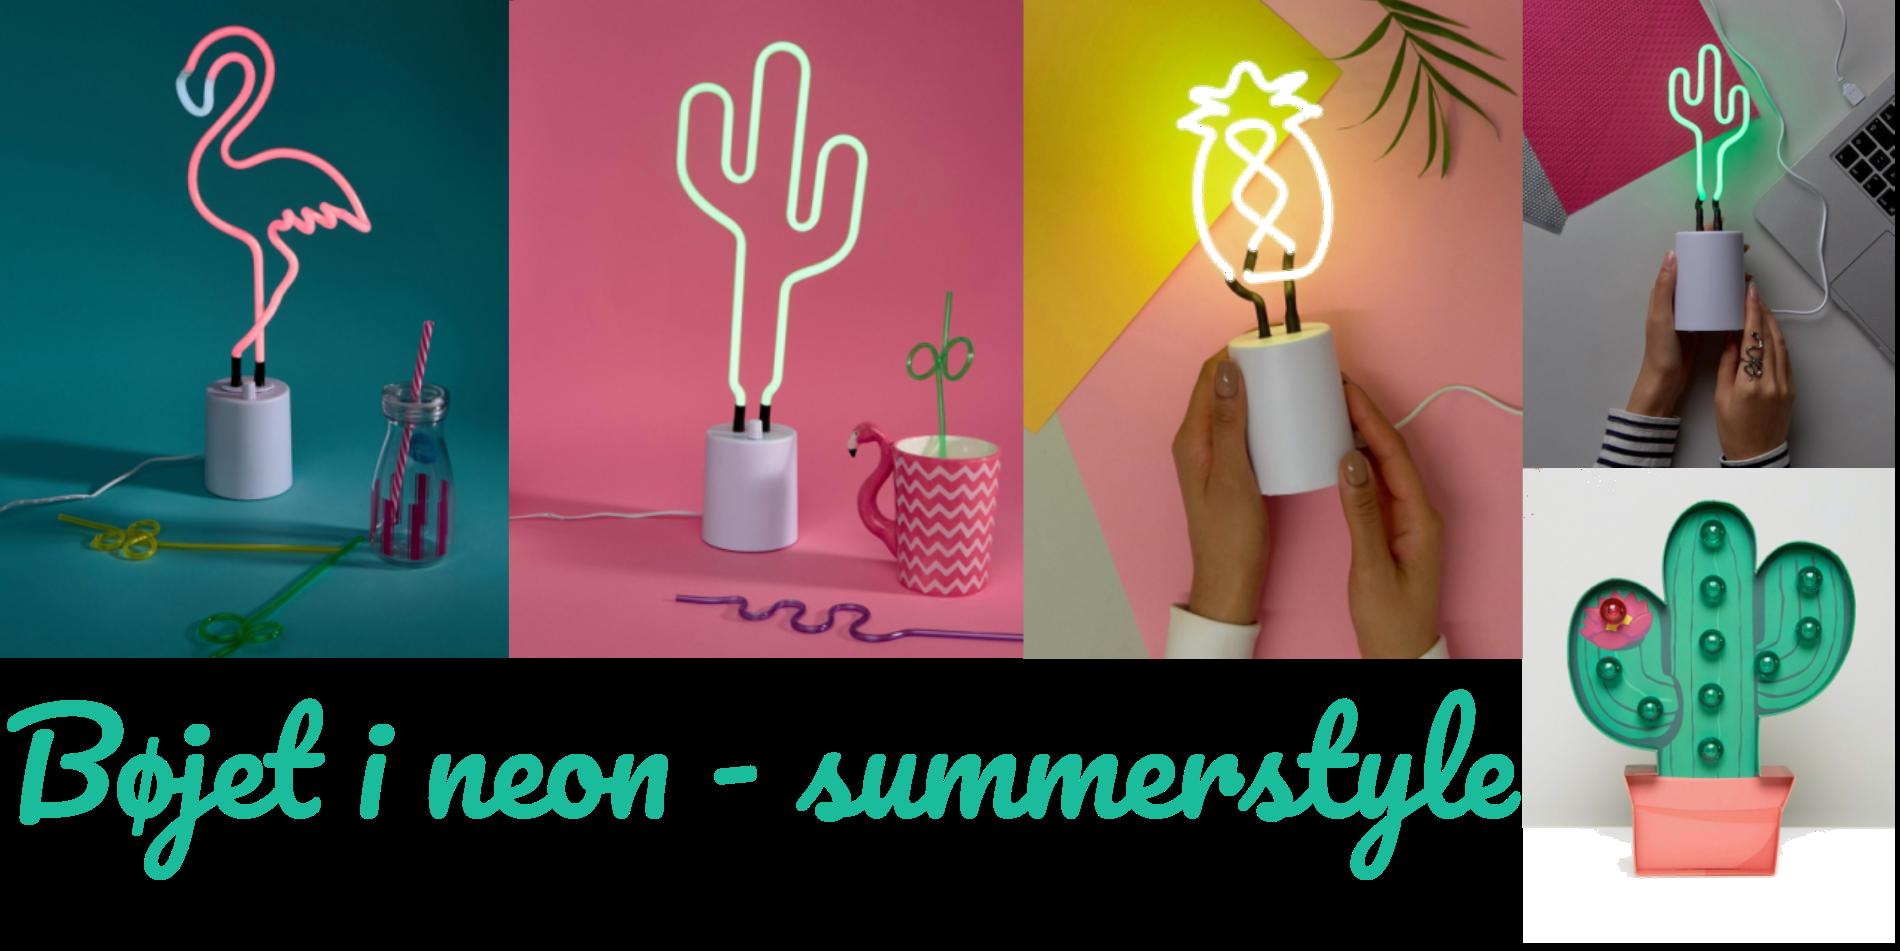 Bøjet i neon - summerstyle